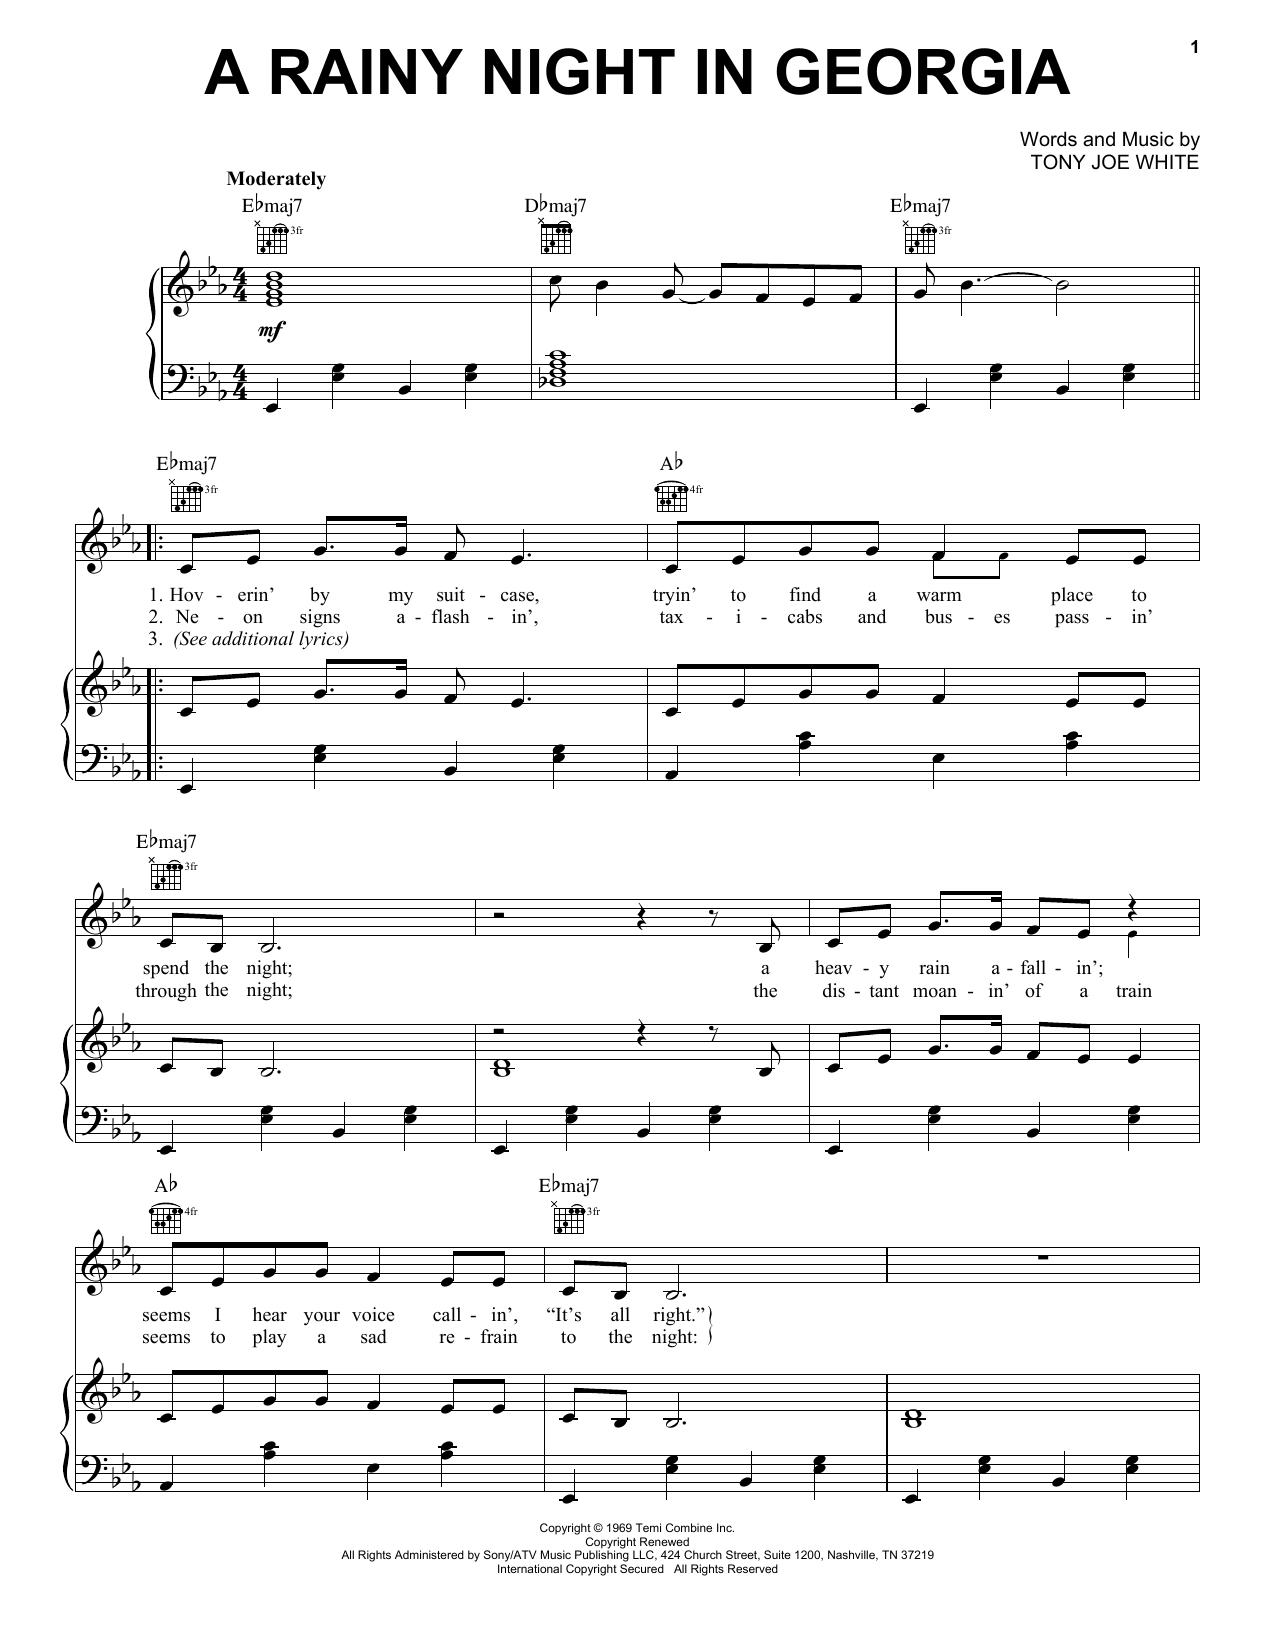 A Rainy Night In Georgia sheet music